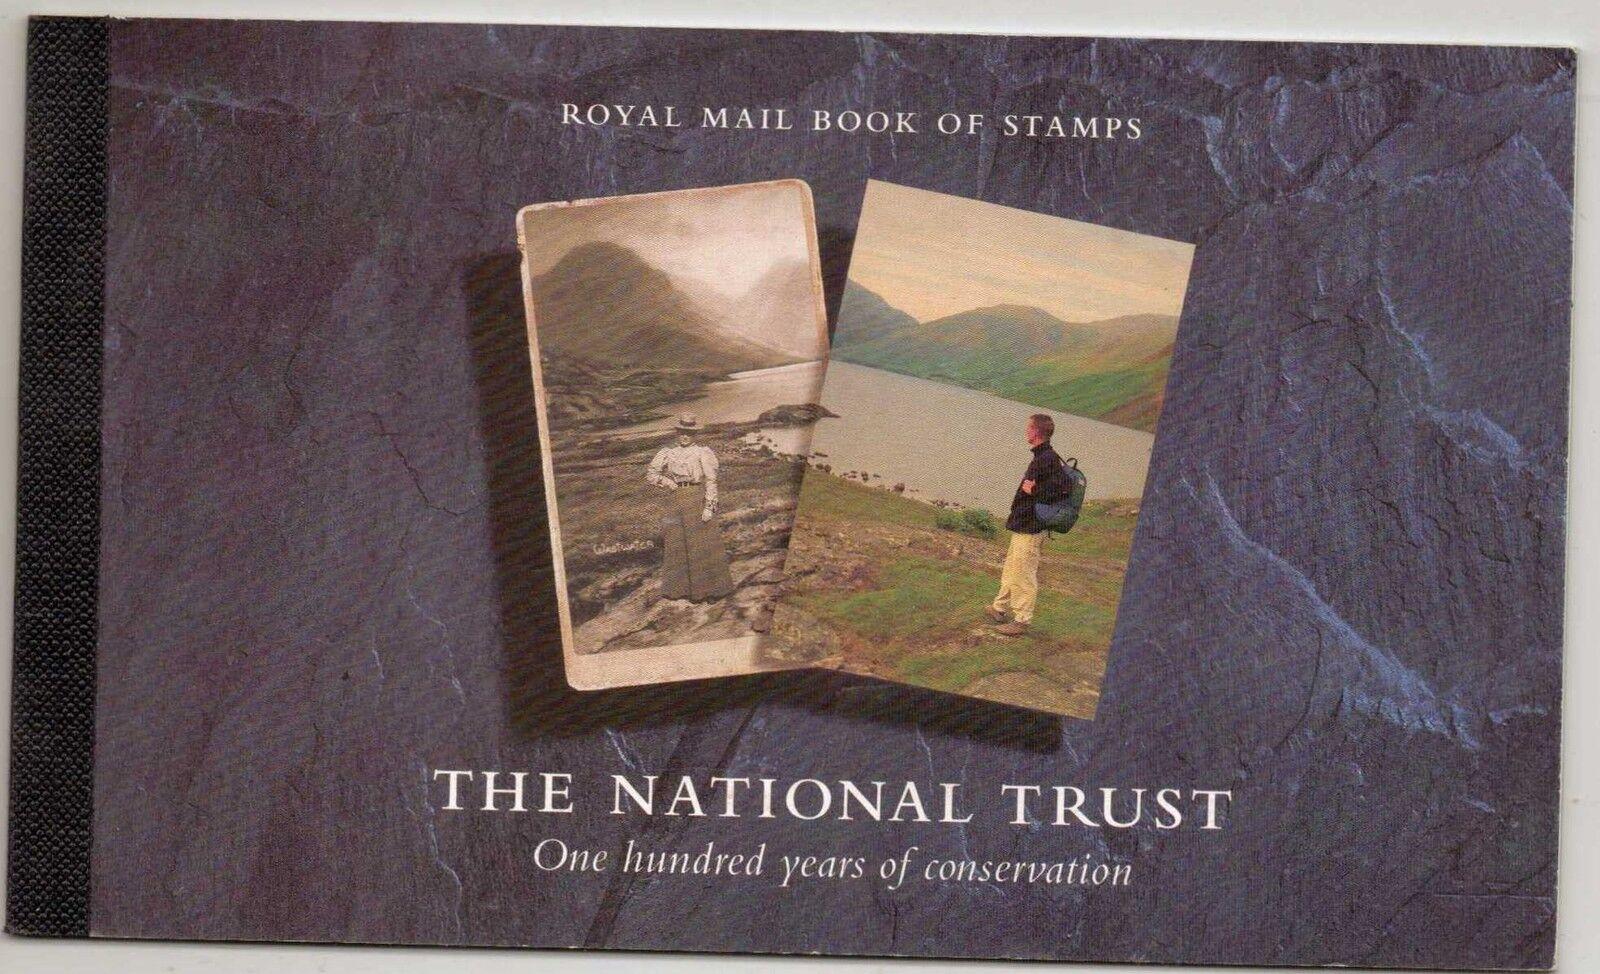 GB SGDX17 1995 NATIONAL TRUST  BOOKLET MNH